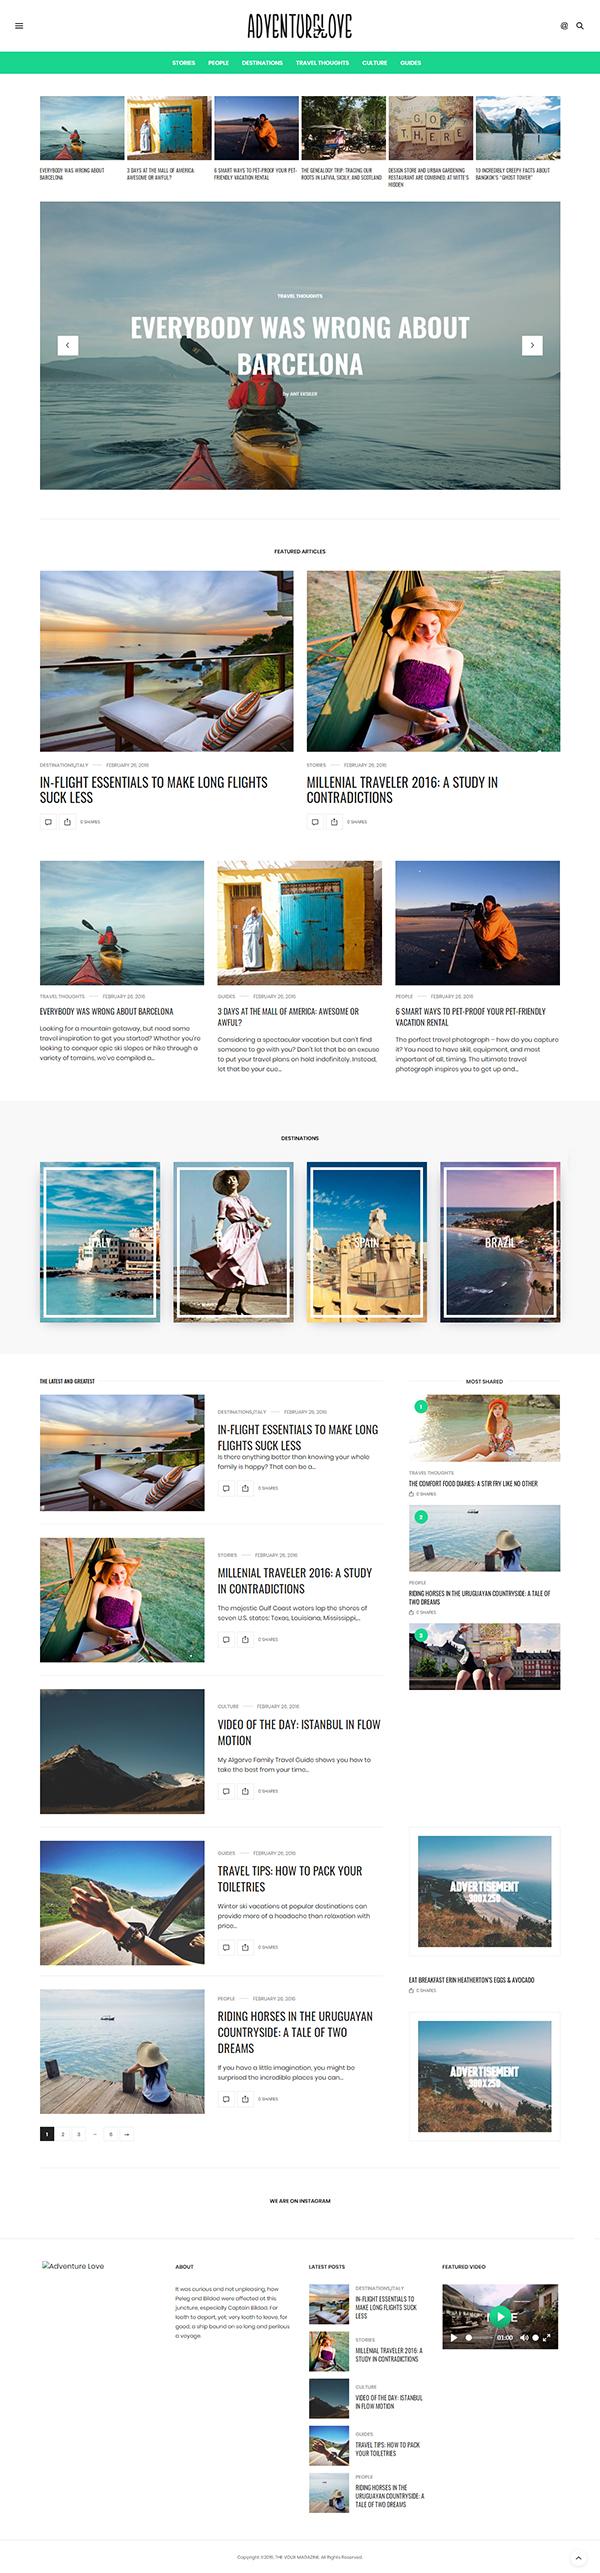 The Voux - A Comprehensive Magazine WordPress Theme